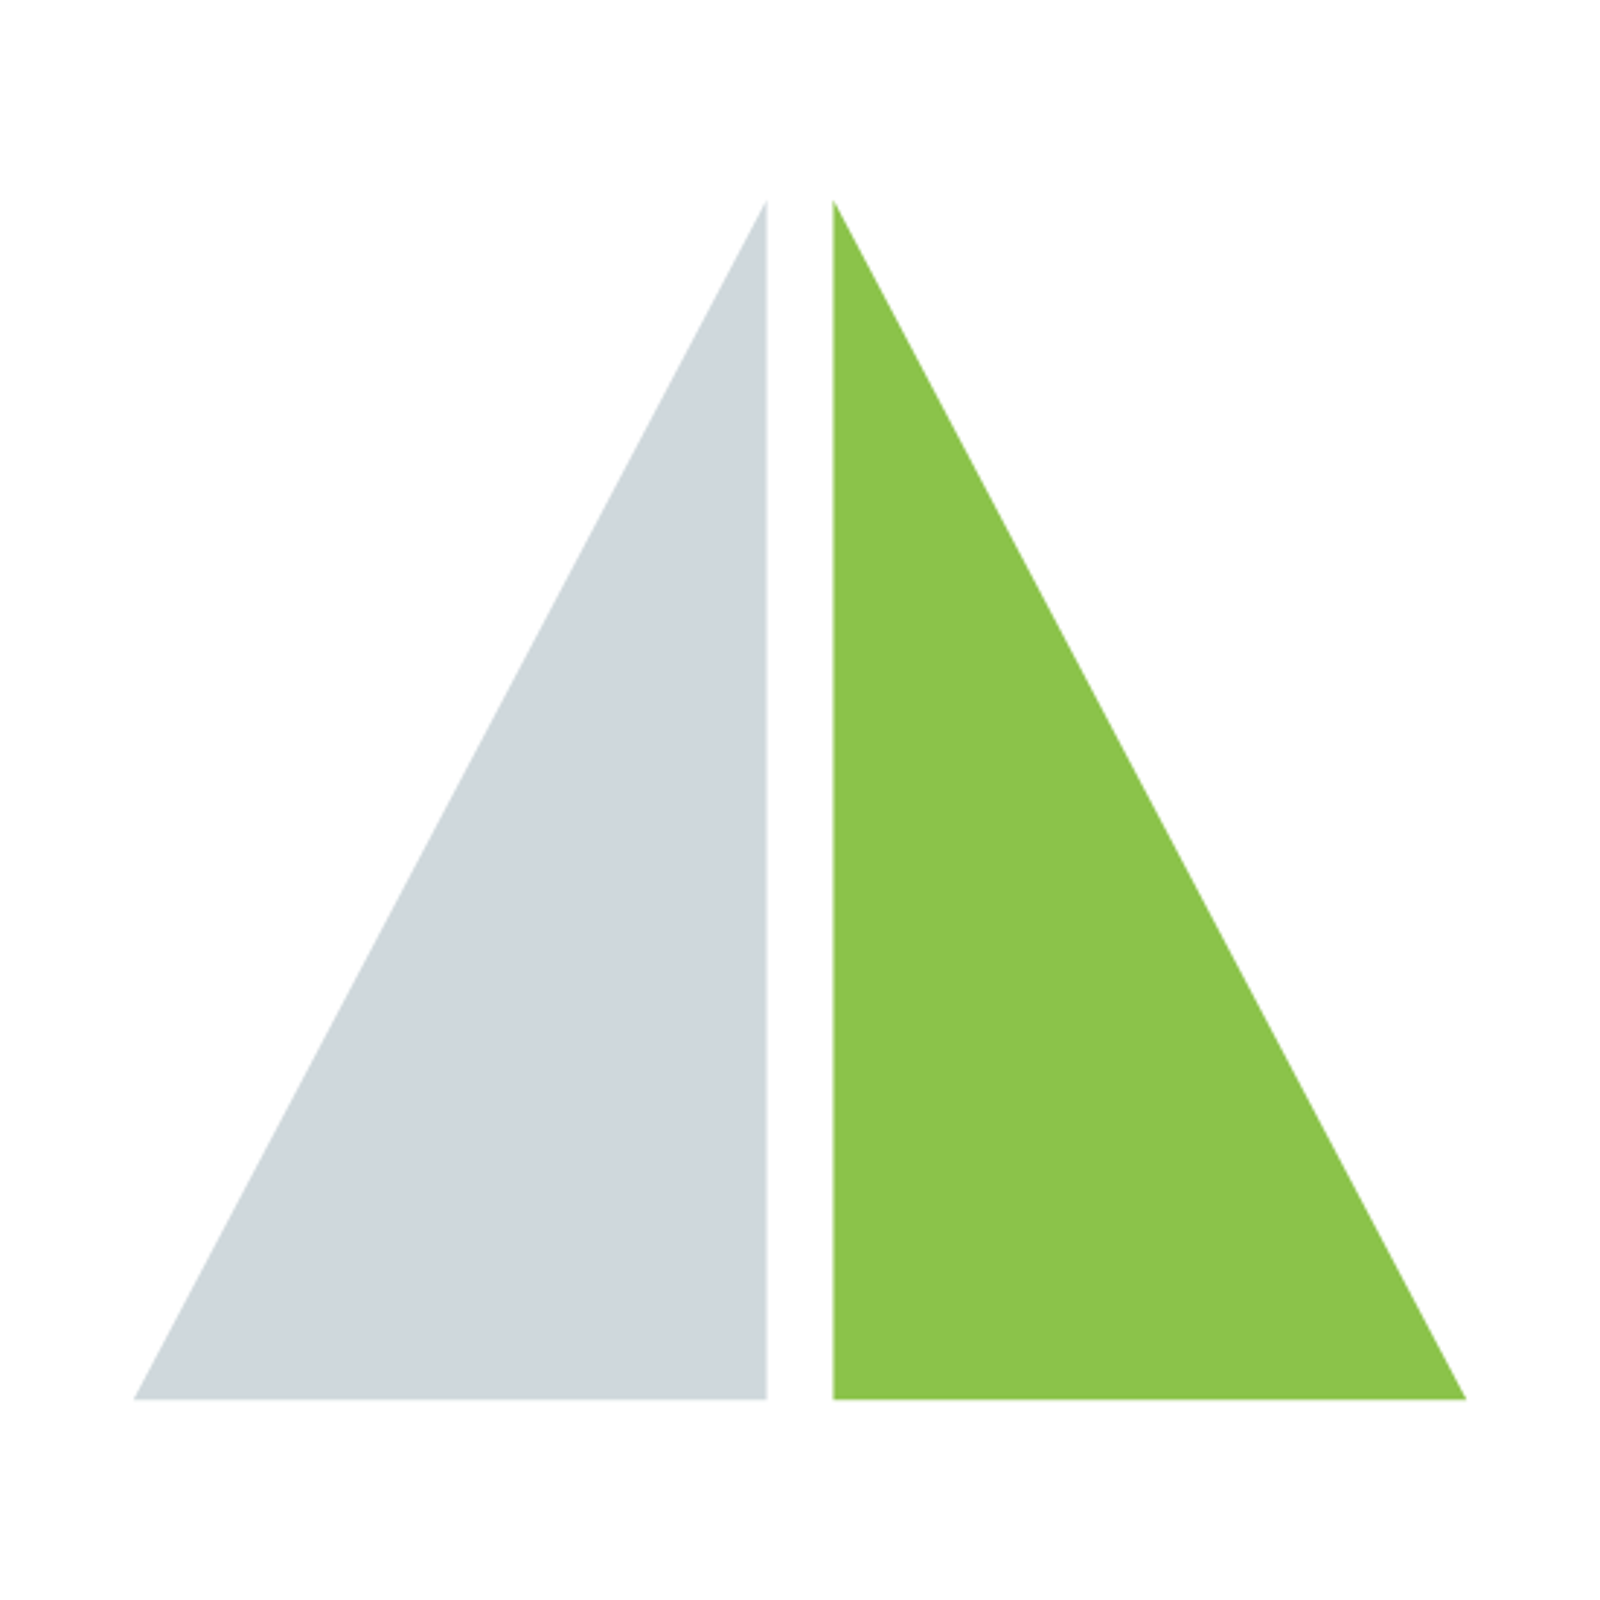 左右反転 icon